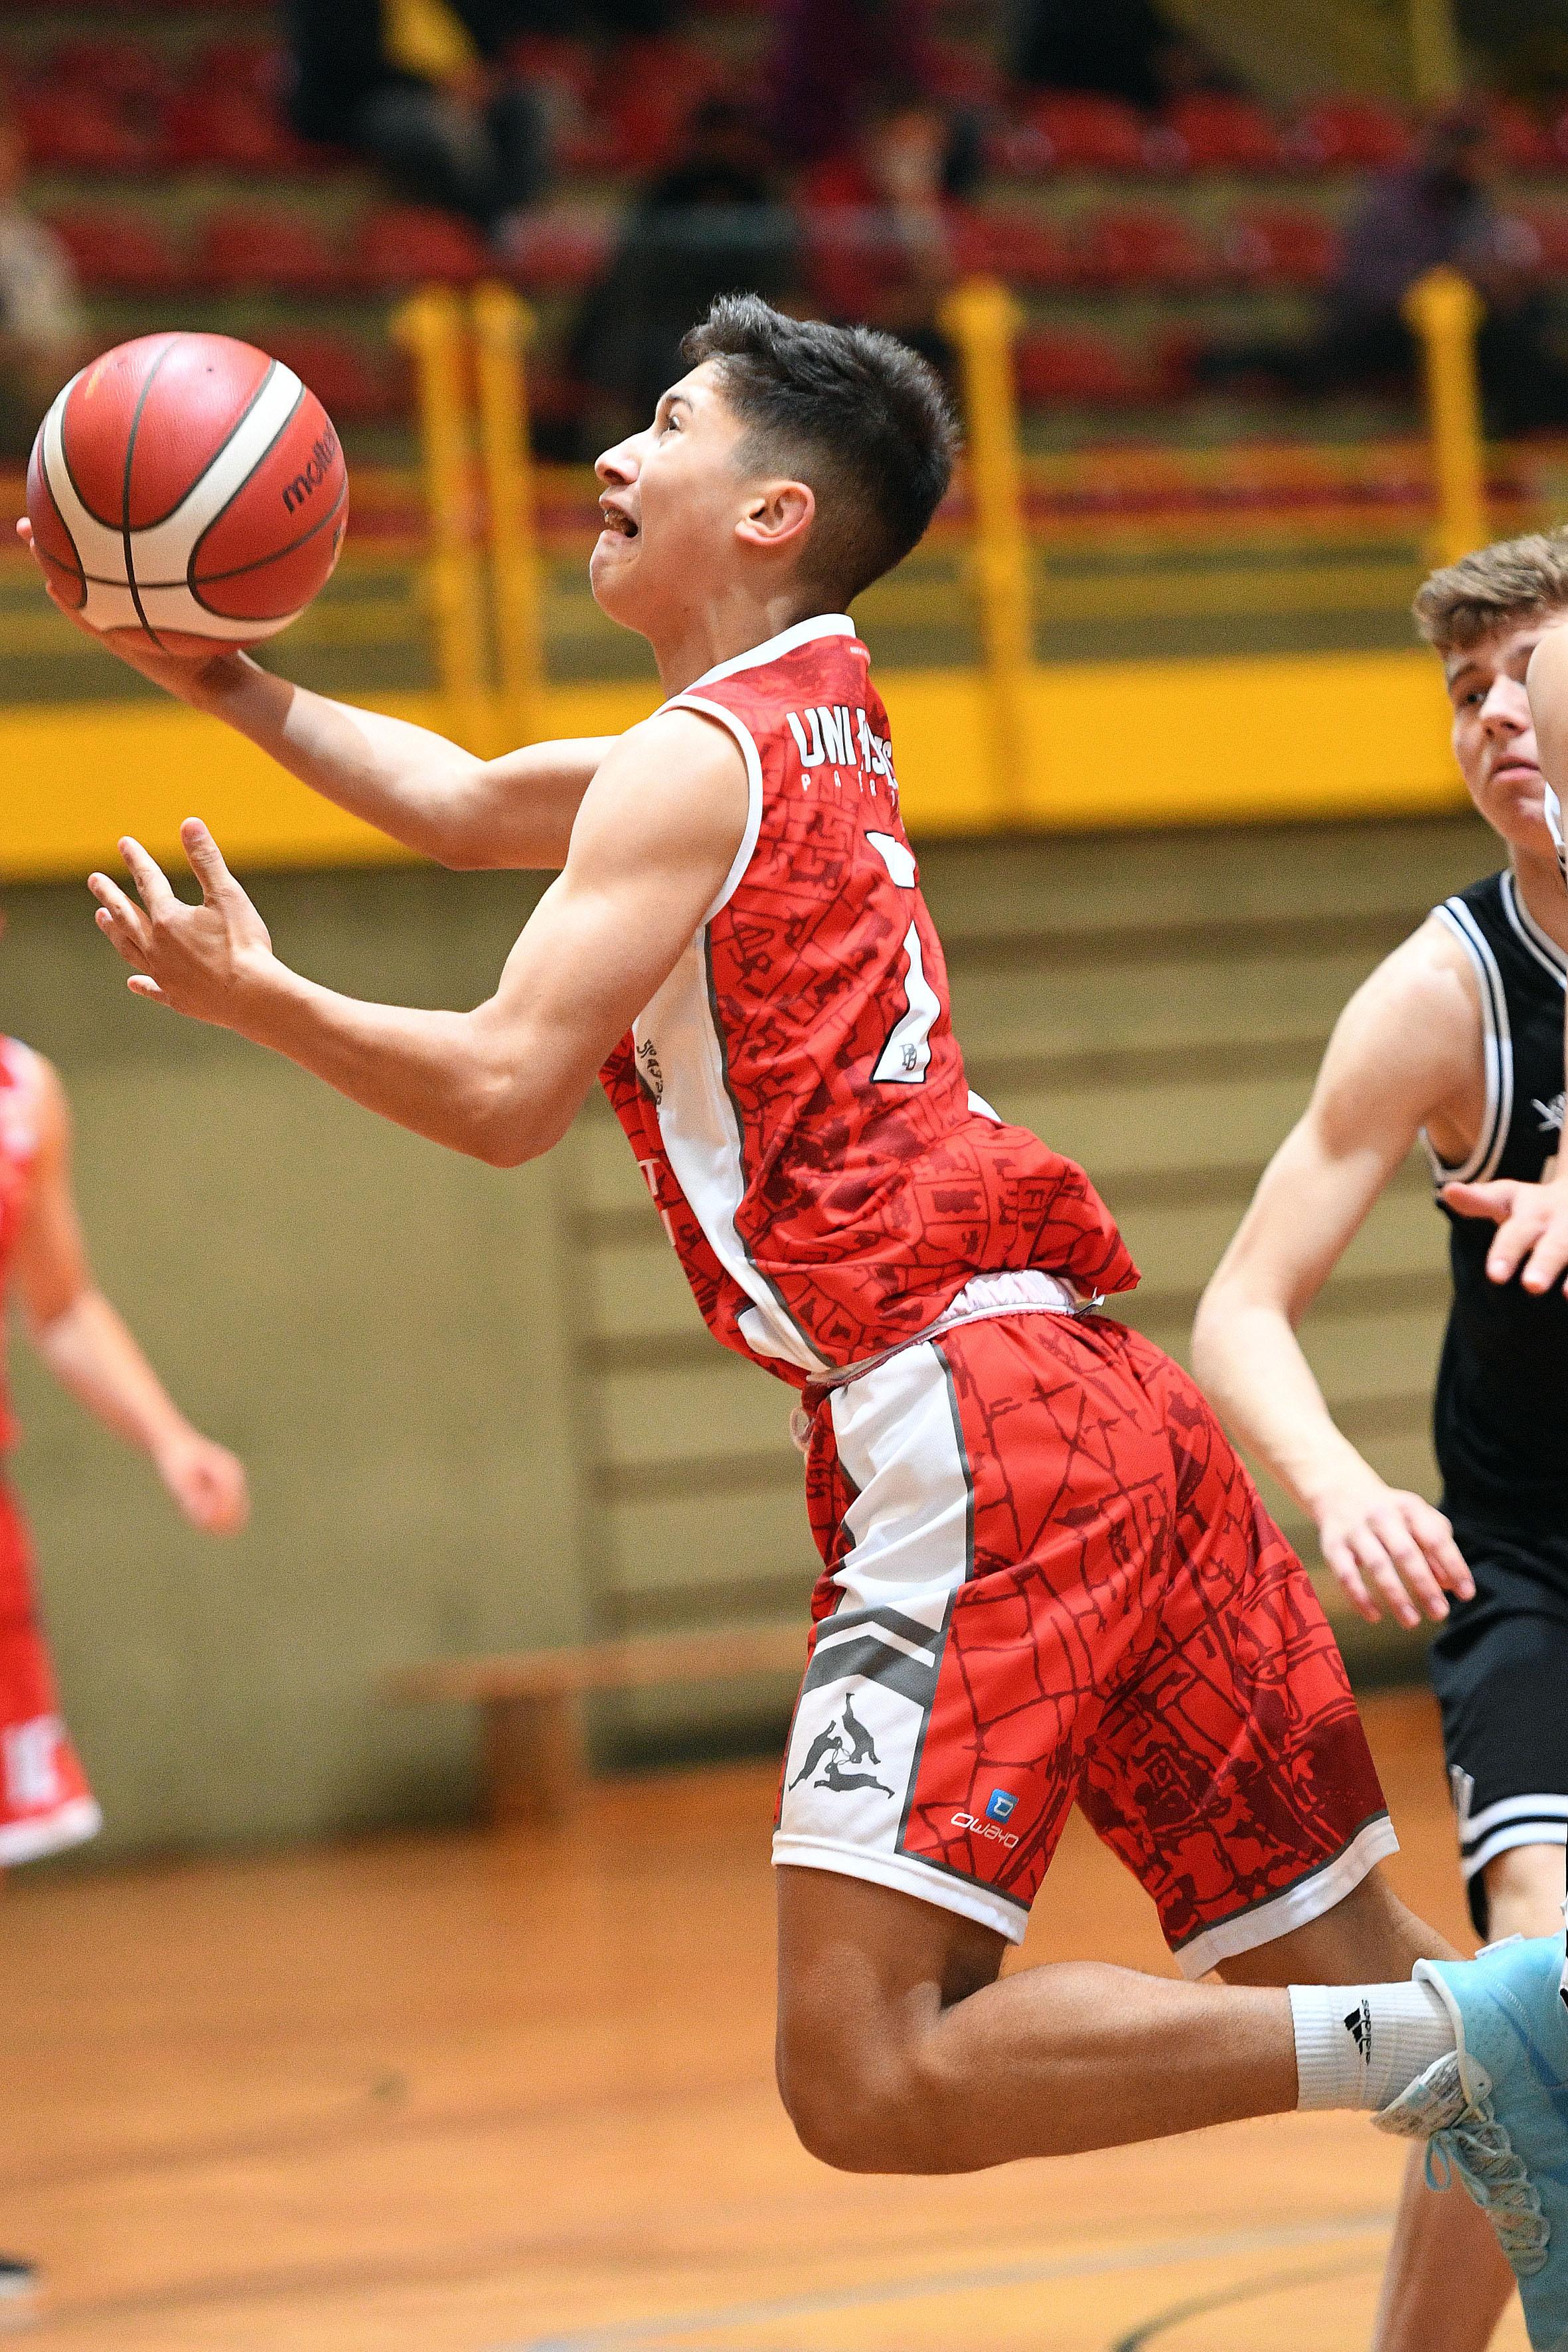 2020-10-18-JBBL-Uni-Baskets-Paderborn-UBC-Muenster_8452